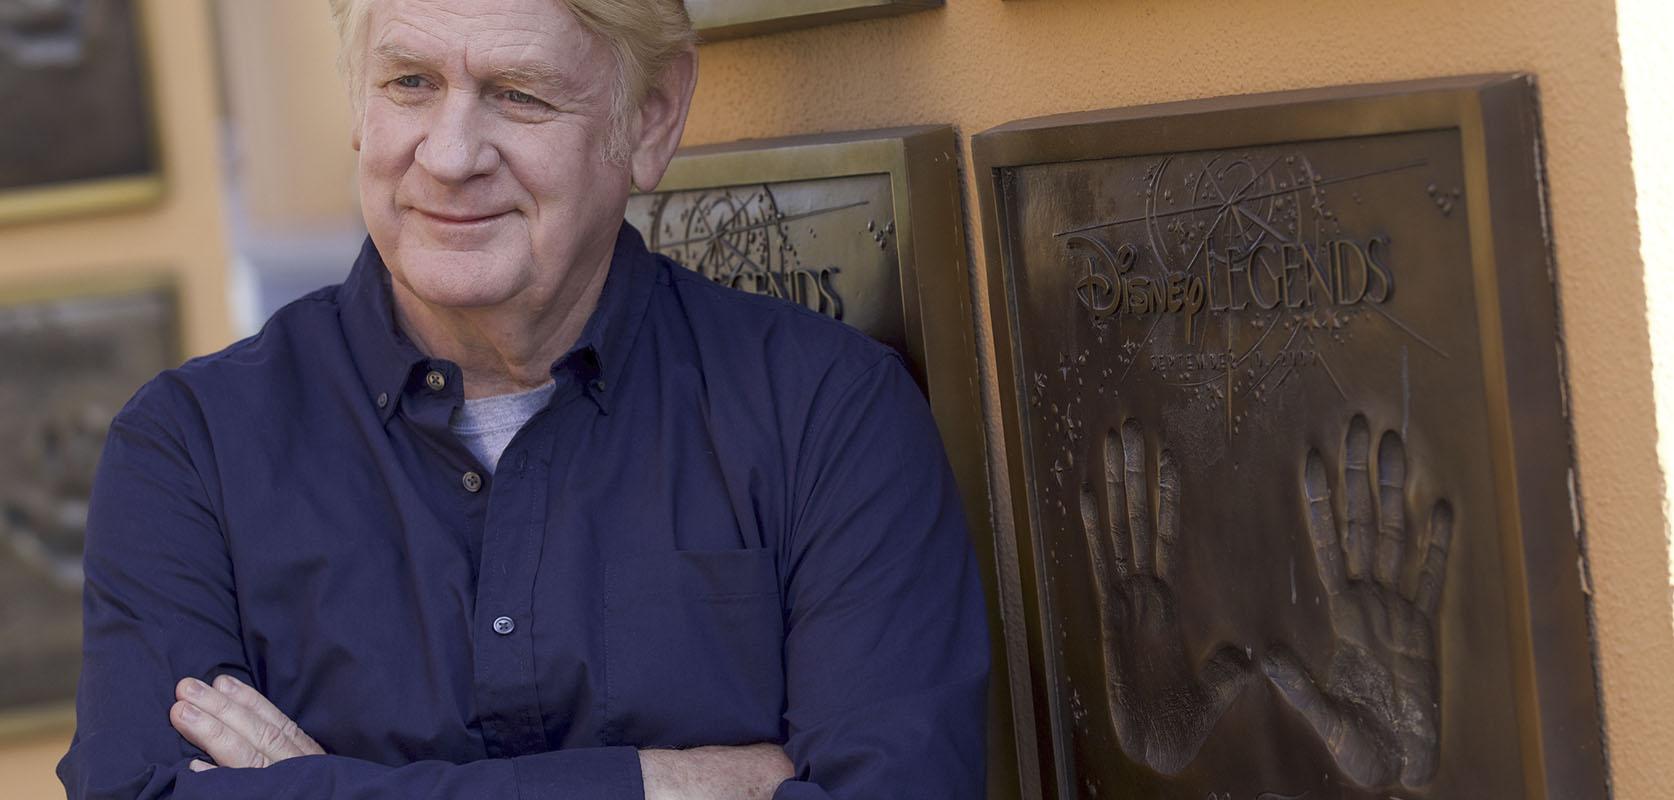 Disney Legend, Bill Farmer